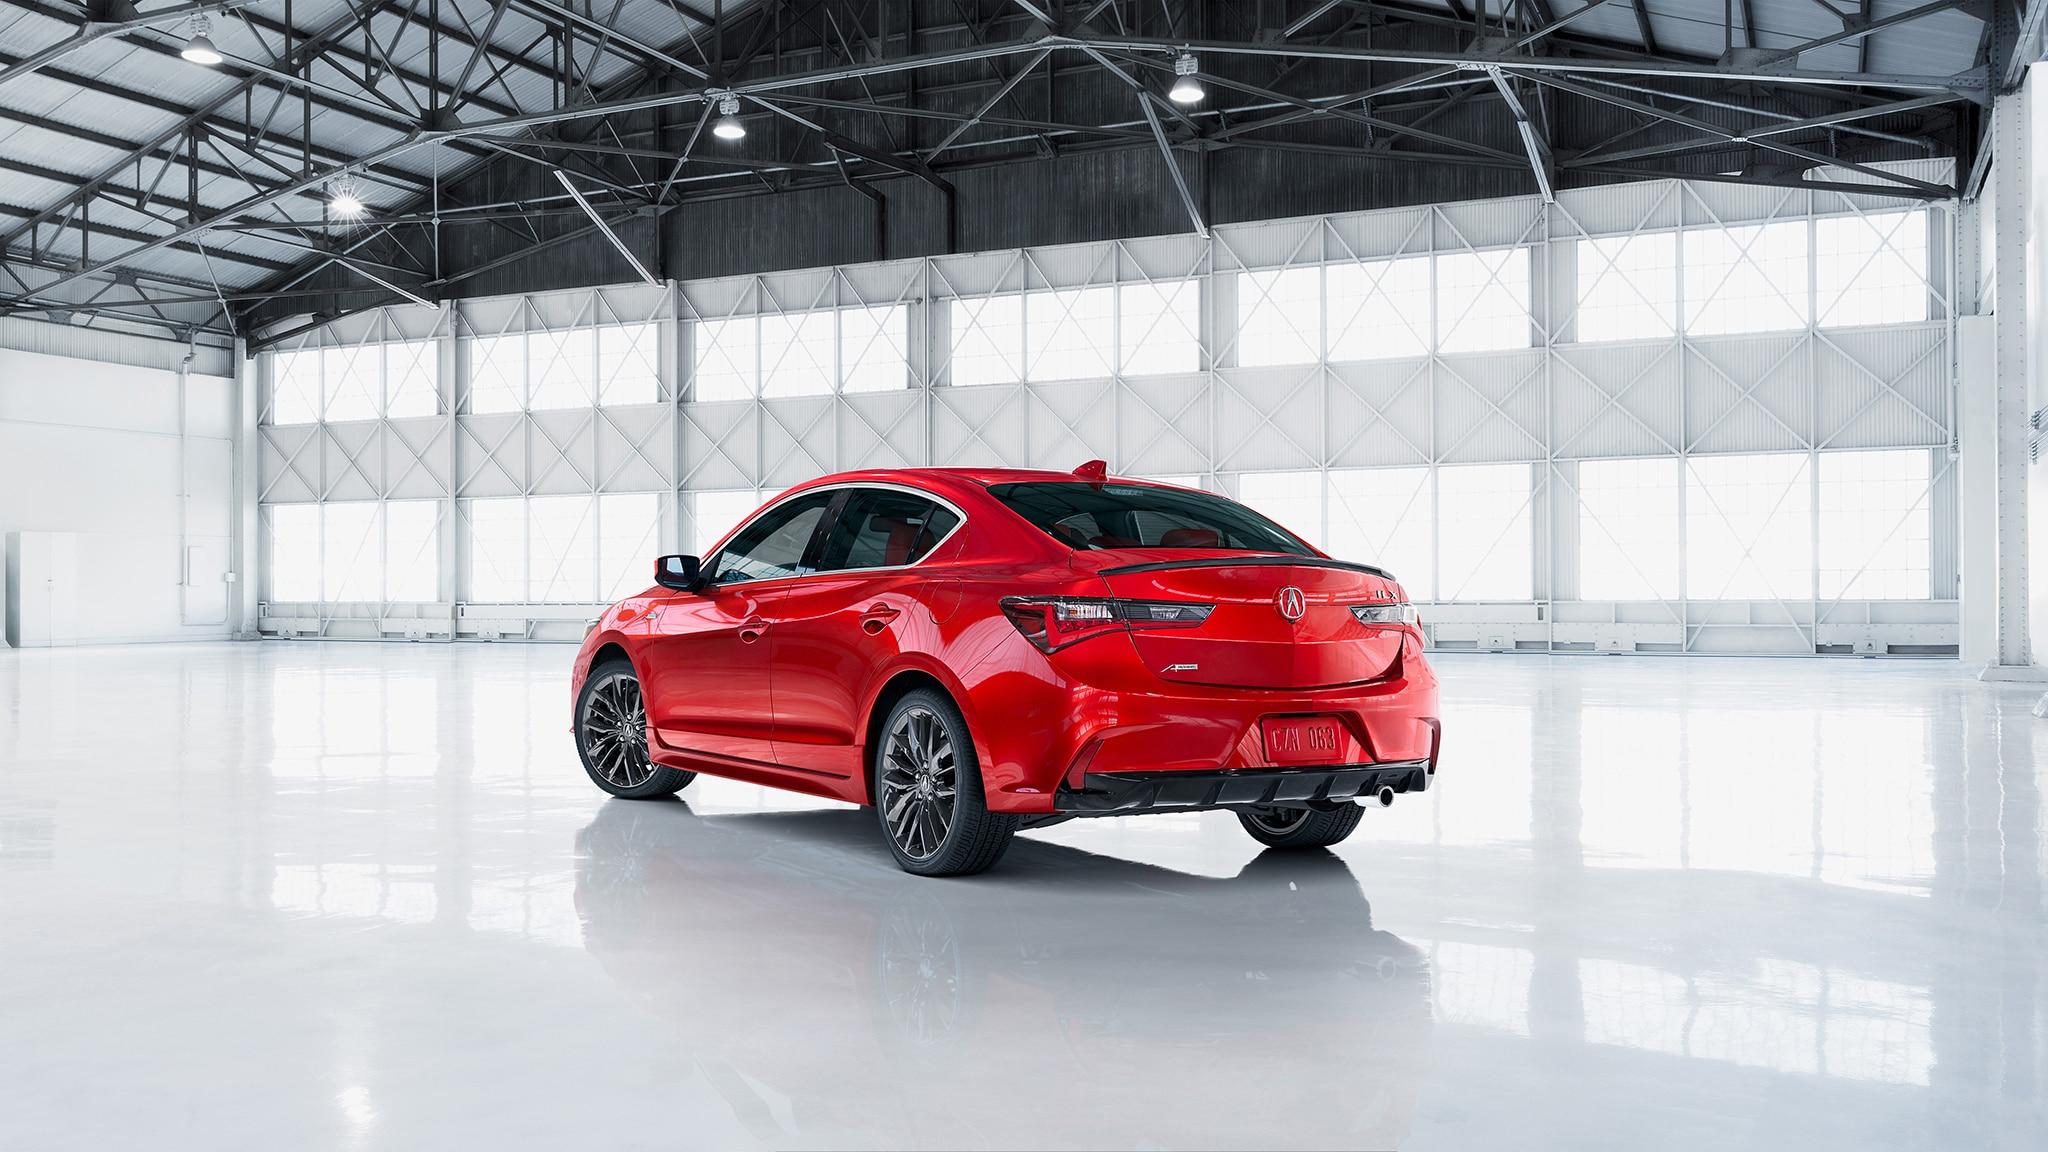 Refreshed 2019 Acura ILX Sports a Meaner Mug | Automobile ...